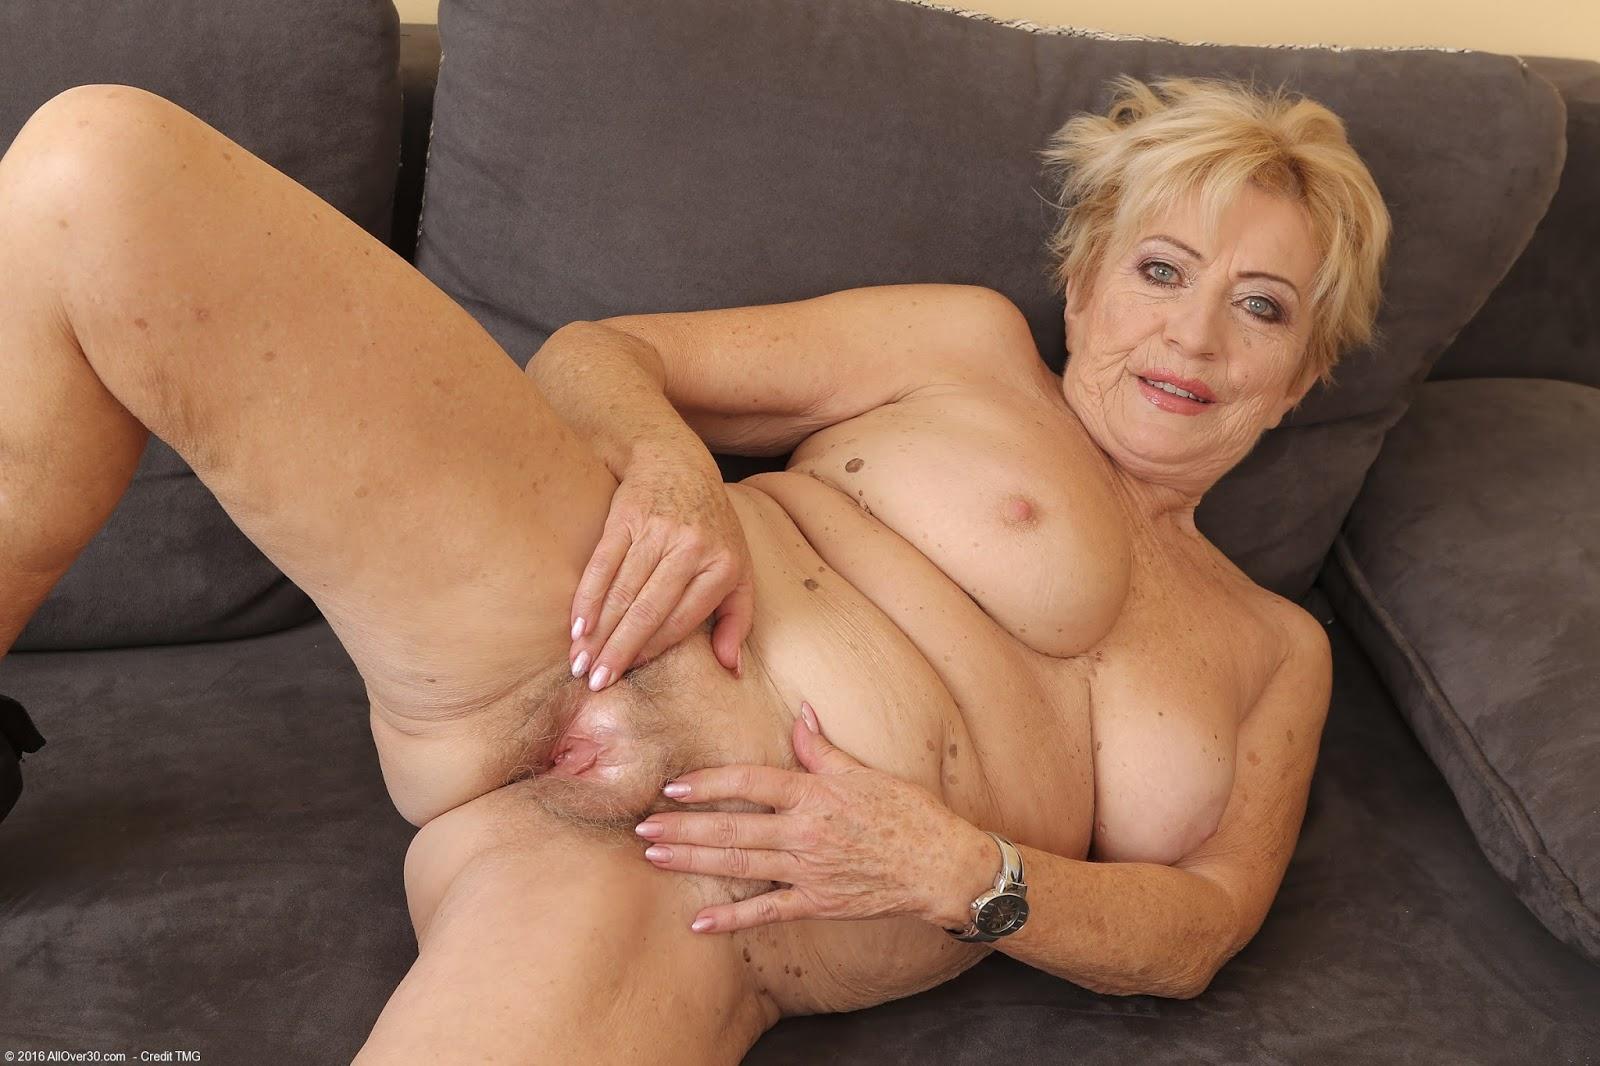 Fucking Julia aged grannies fuck porn scene Muitooo Gostoosssaaaaaa!!